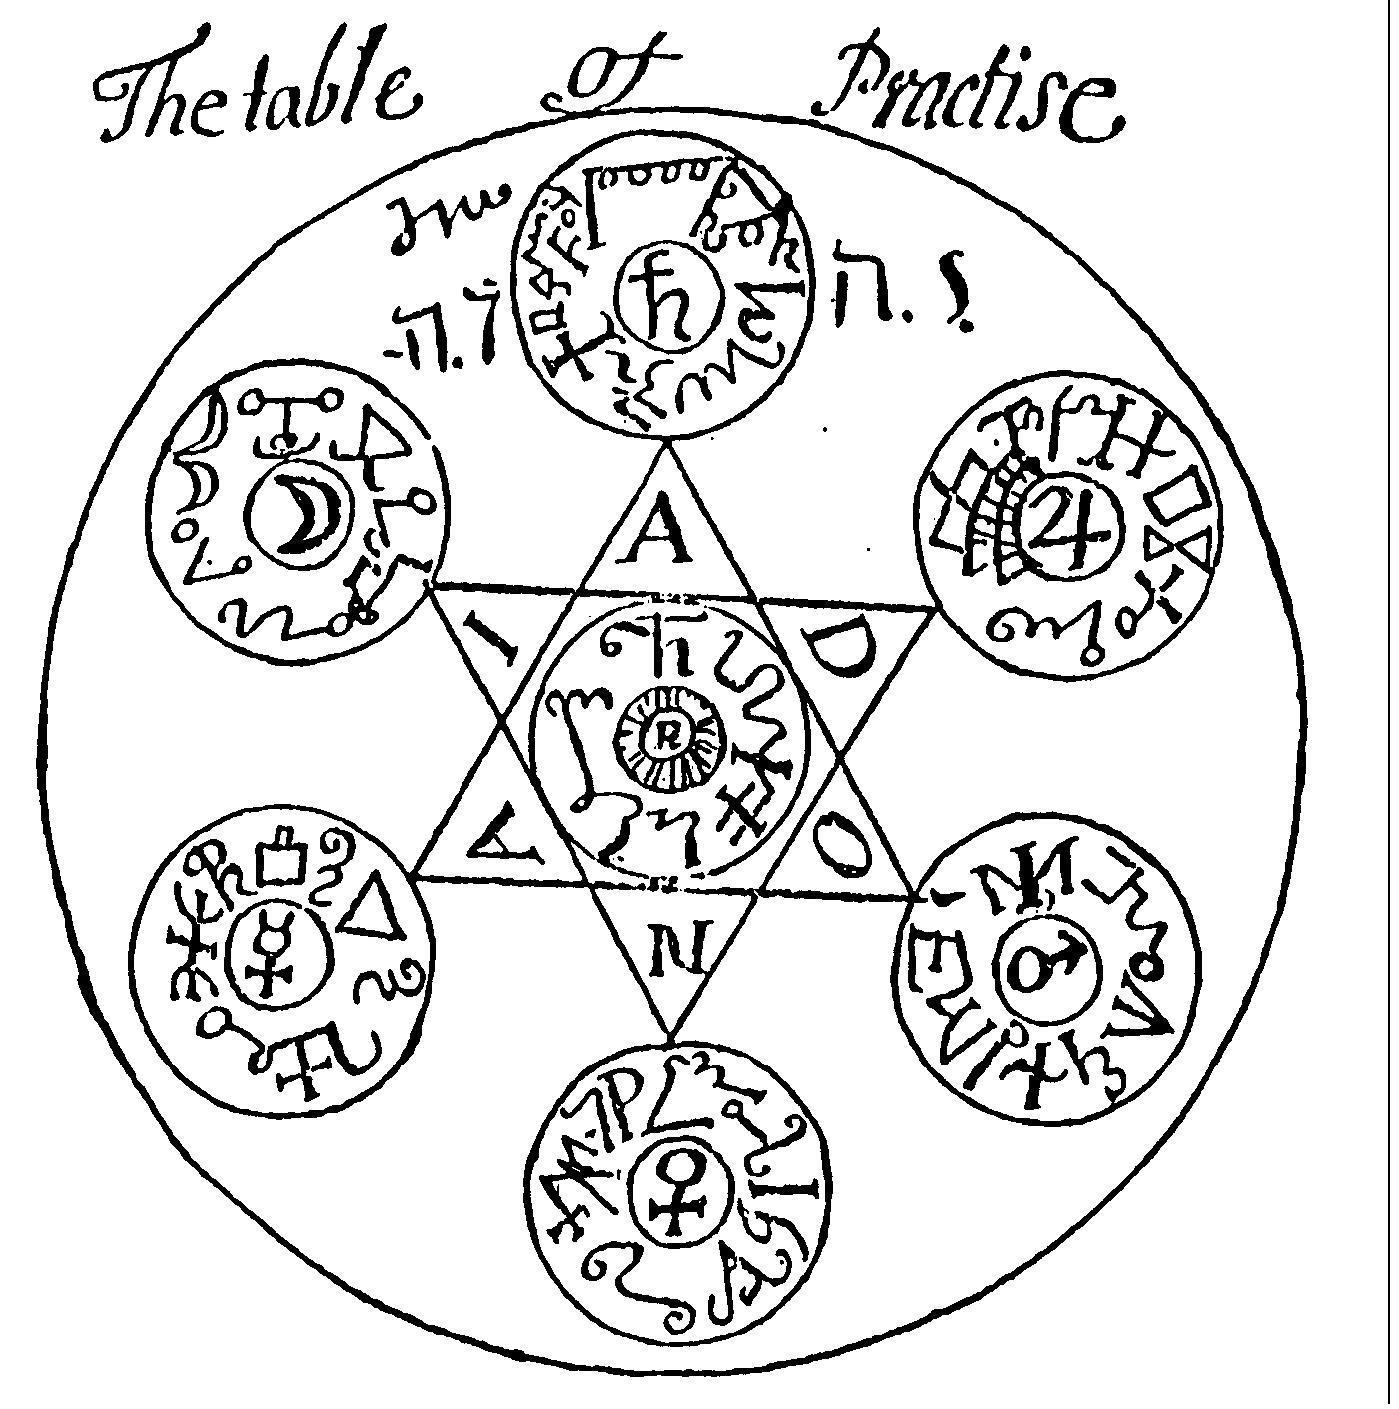 Practical Solomonic Magic 3 1 11